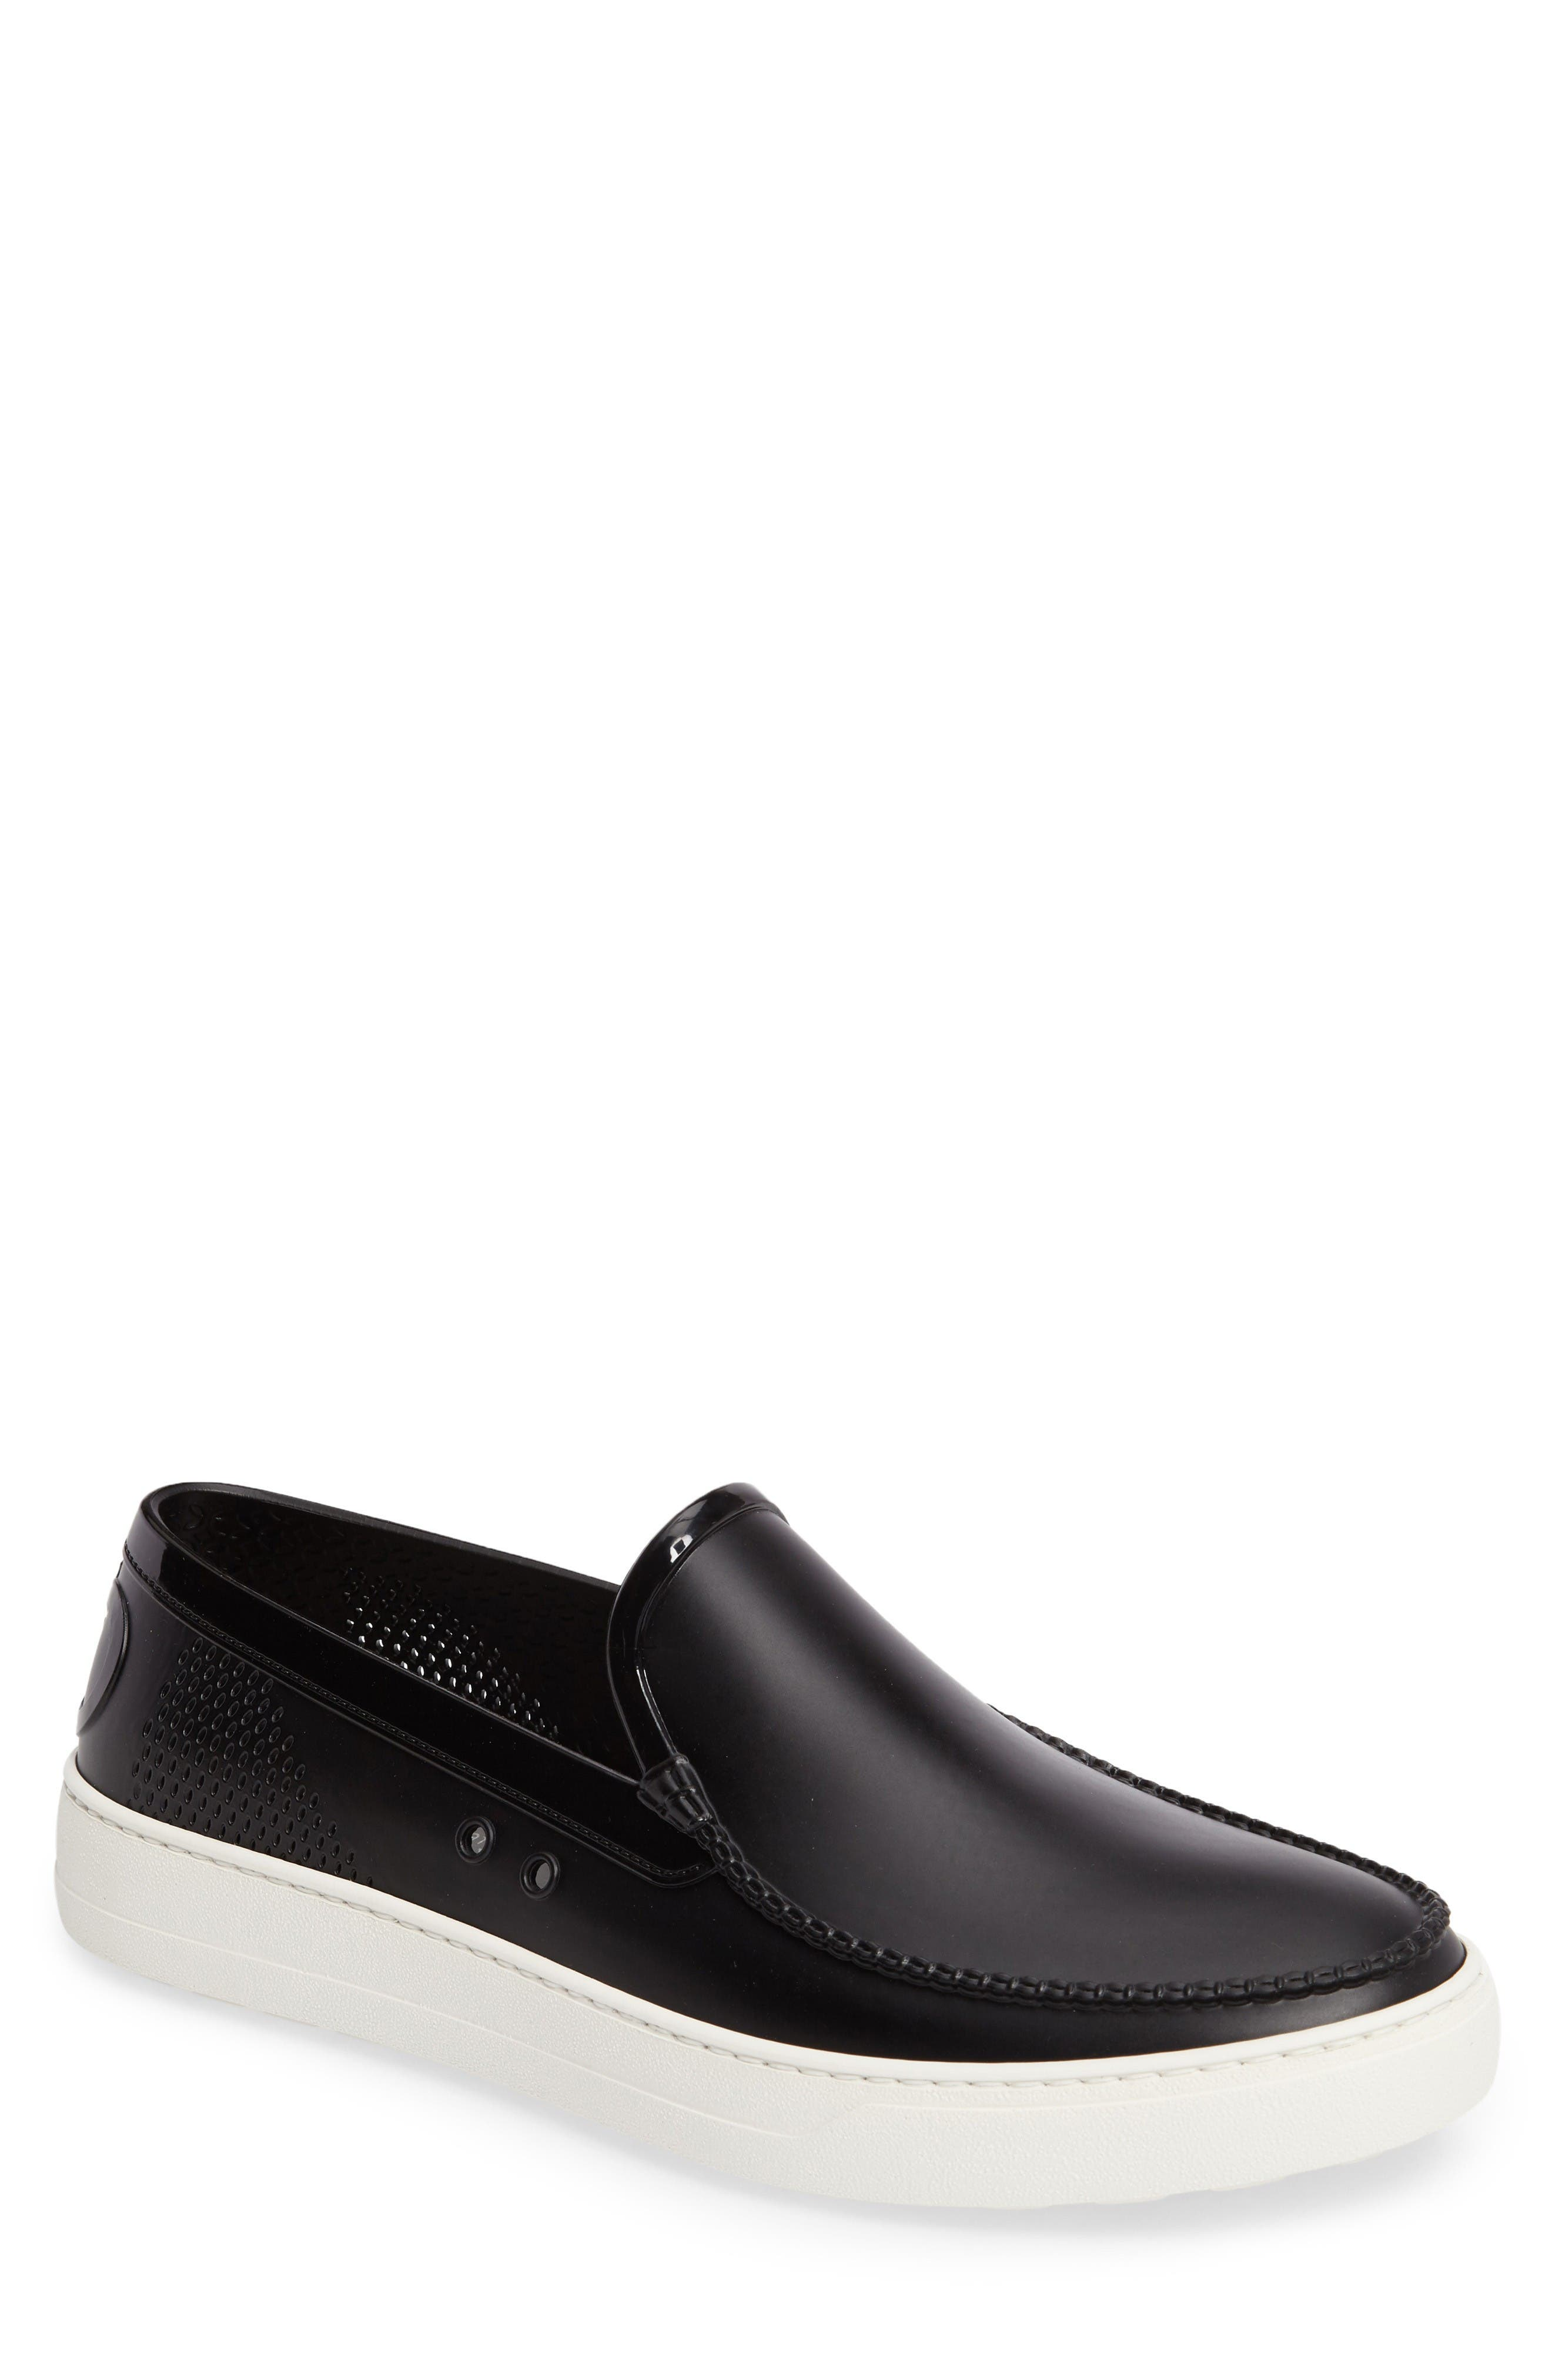 Salvatore Ferragamo Fury 2 Slip-On Sneaker (Men)